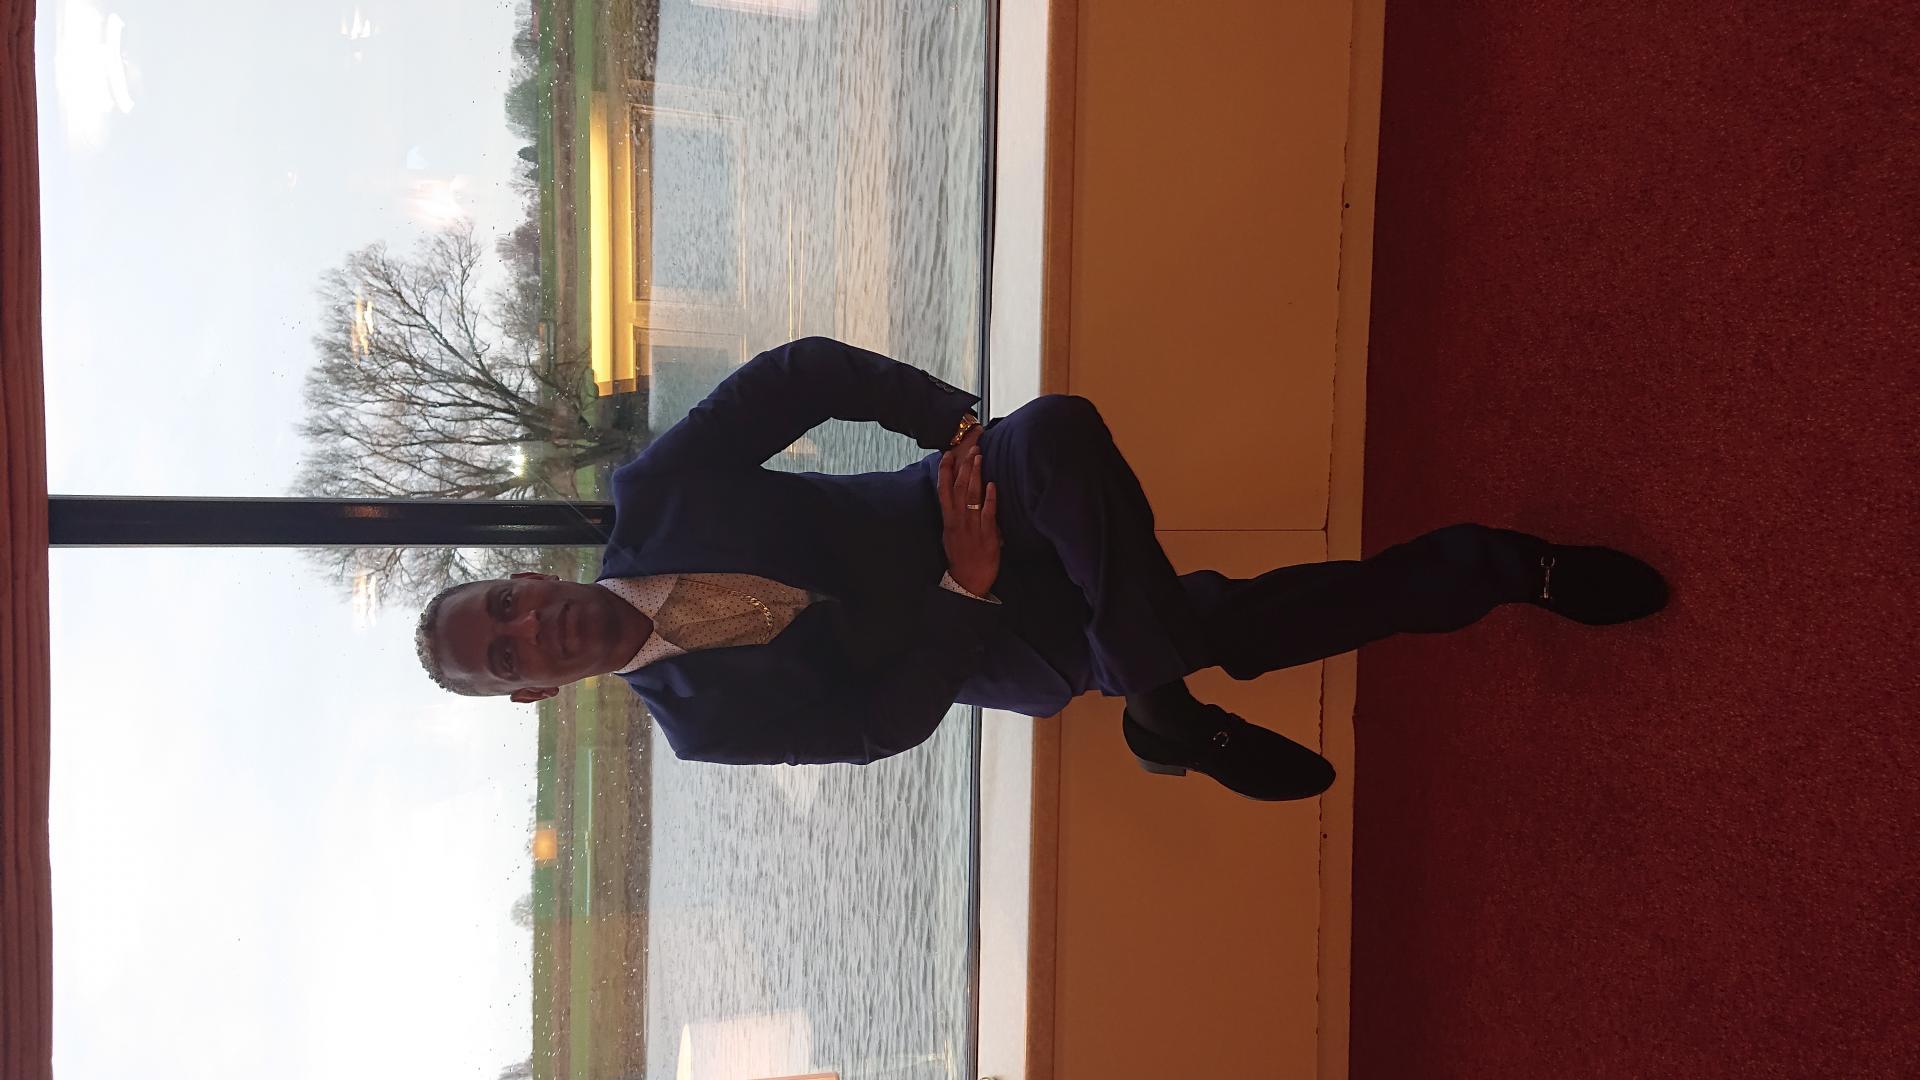 Papitolindo  uit Zuid-Holland,Nederland